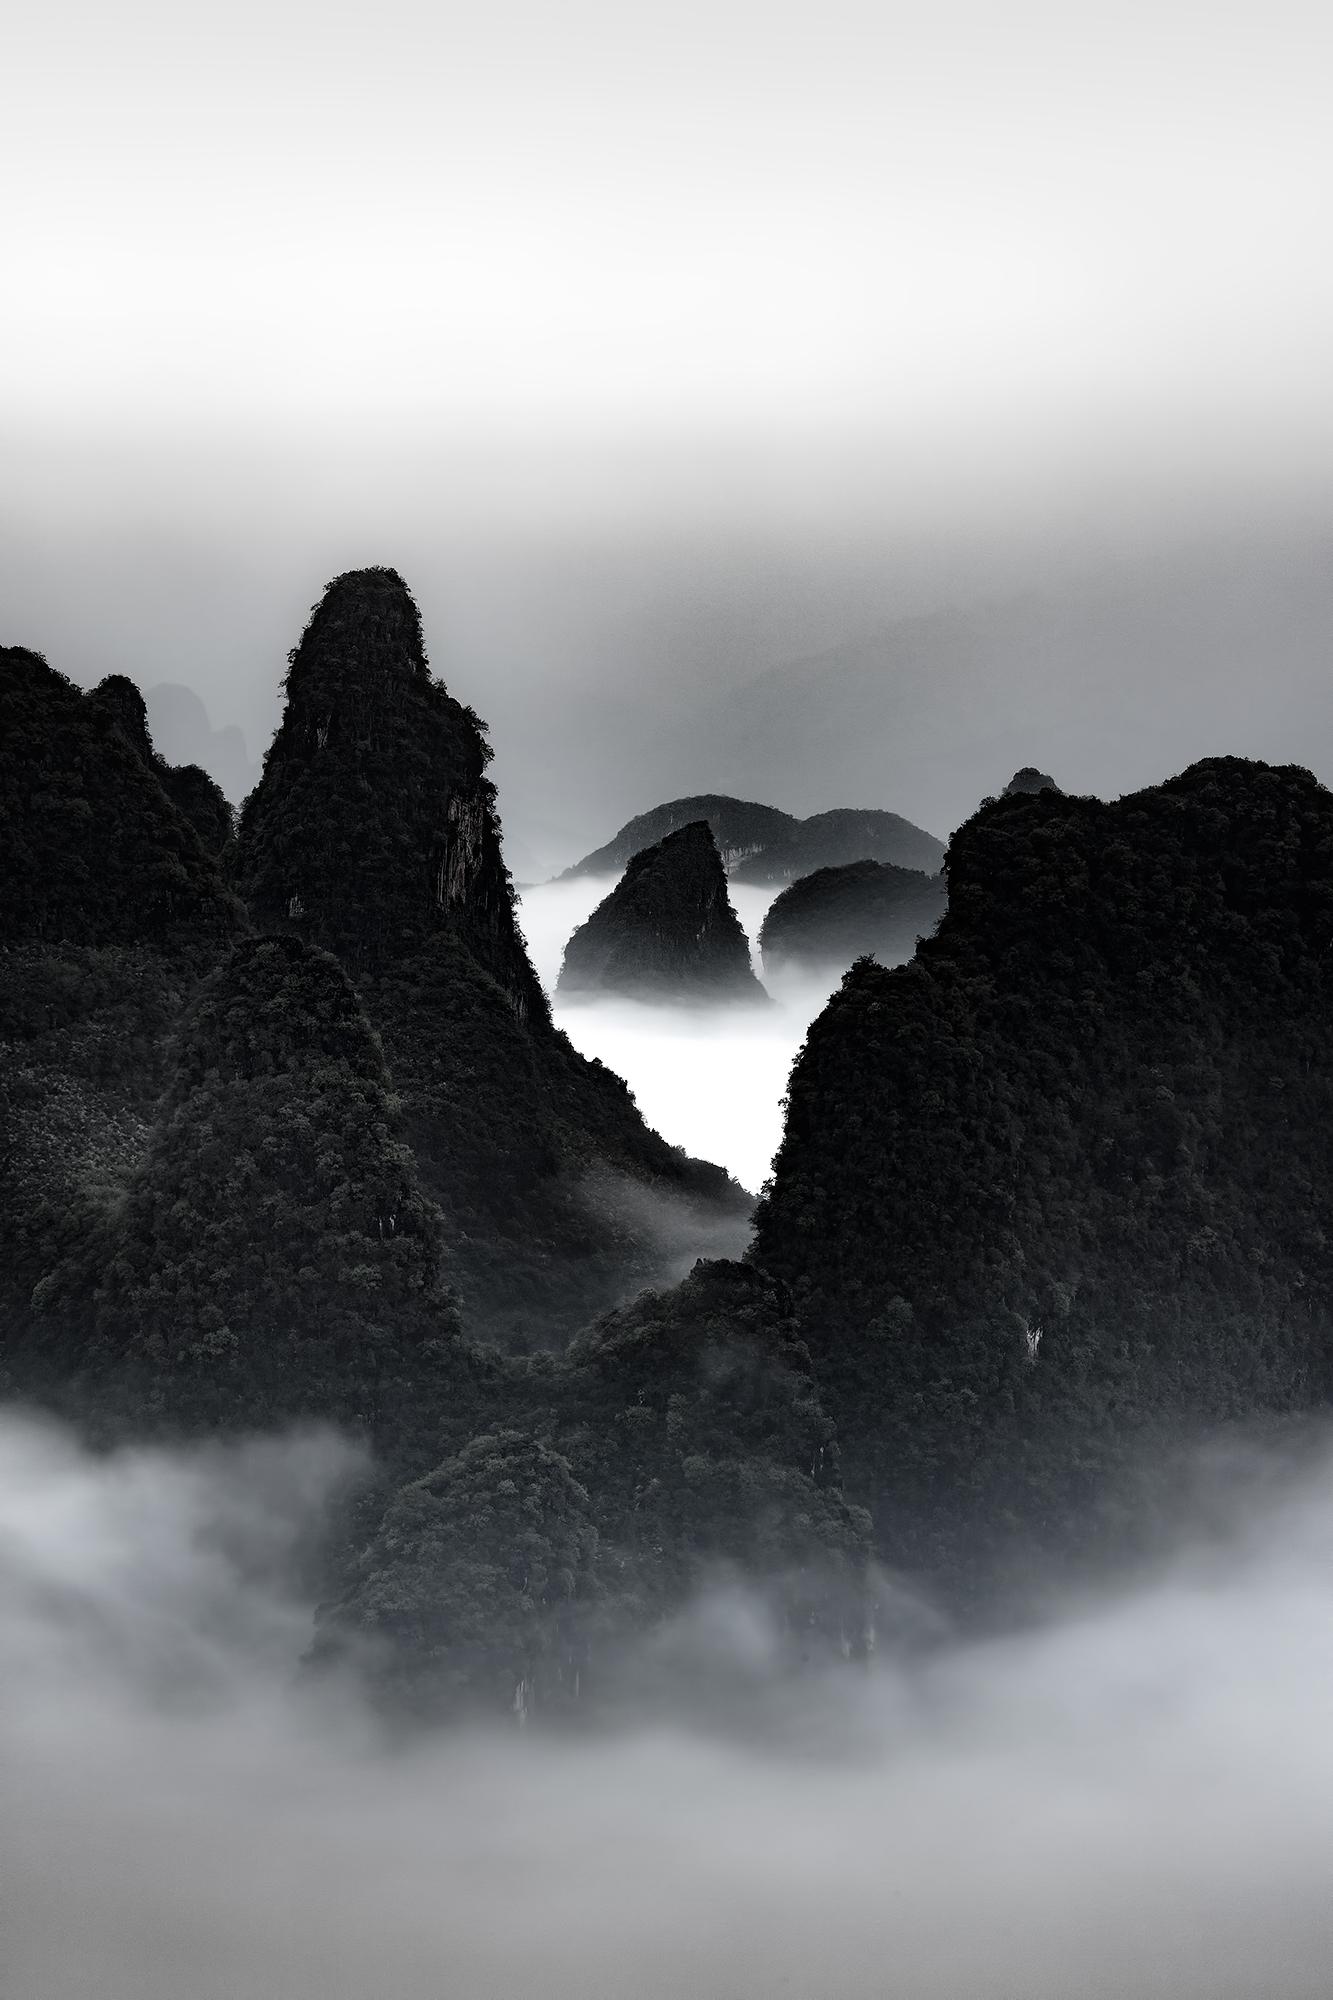 Kingdom - China 2018